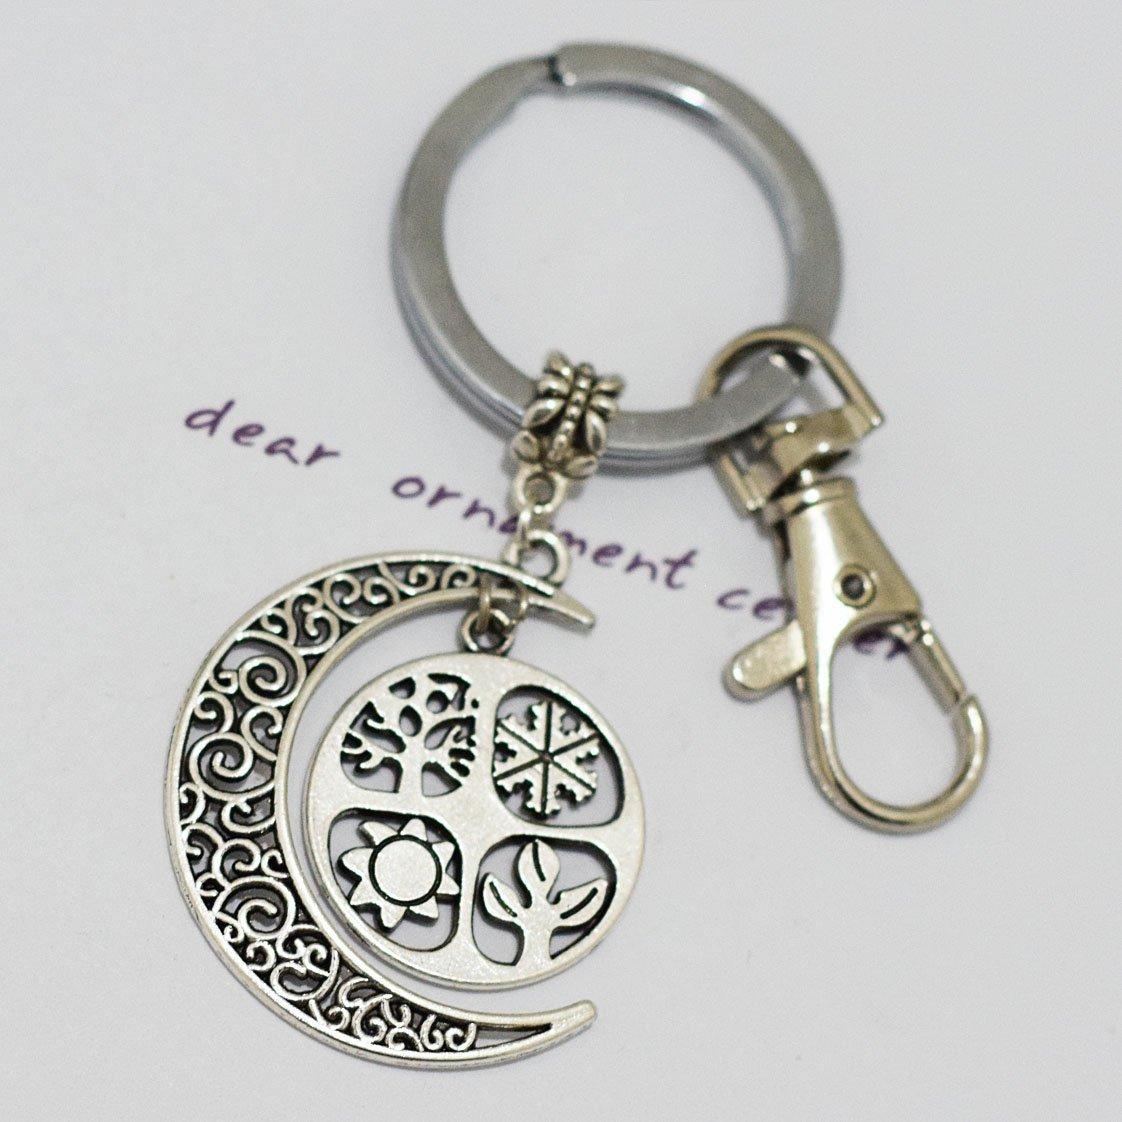 Crescent Moon Four Seasons Keychain, Sabbat Keychain, Wiccan Keychain, Witches Keychain, Pagan Jewellery, Ritual Jewellery, Yule Gift Idea, Pagan Gifts Keychain ping